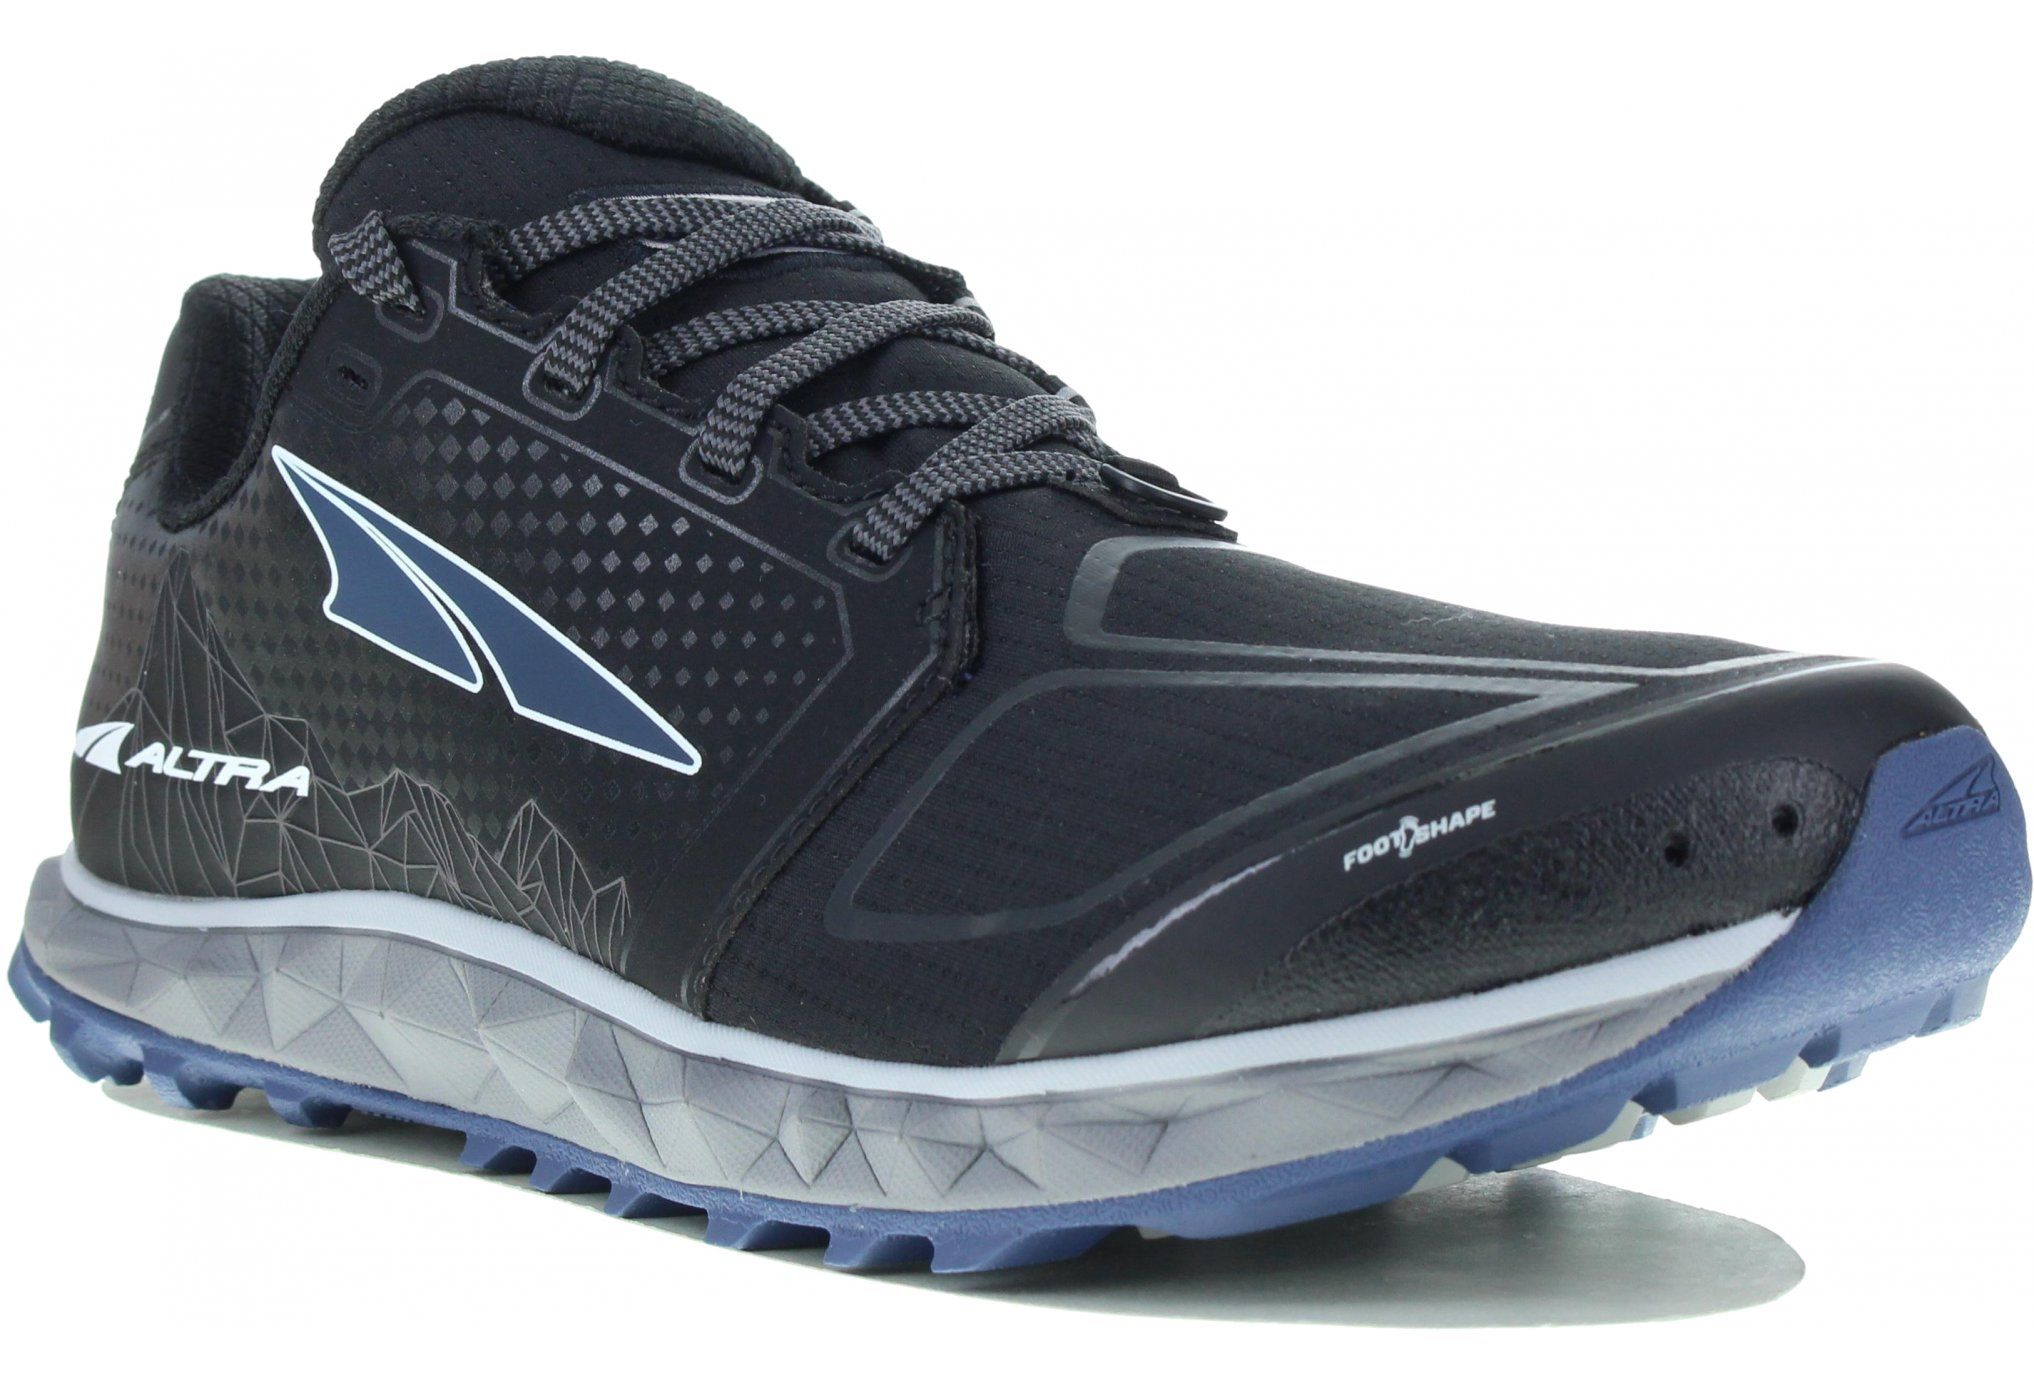 Altra Superior 4.0 Chaussures running femme